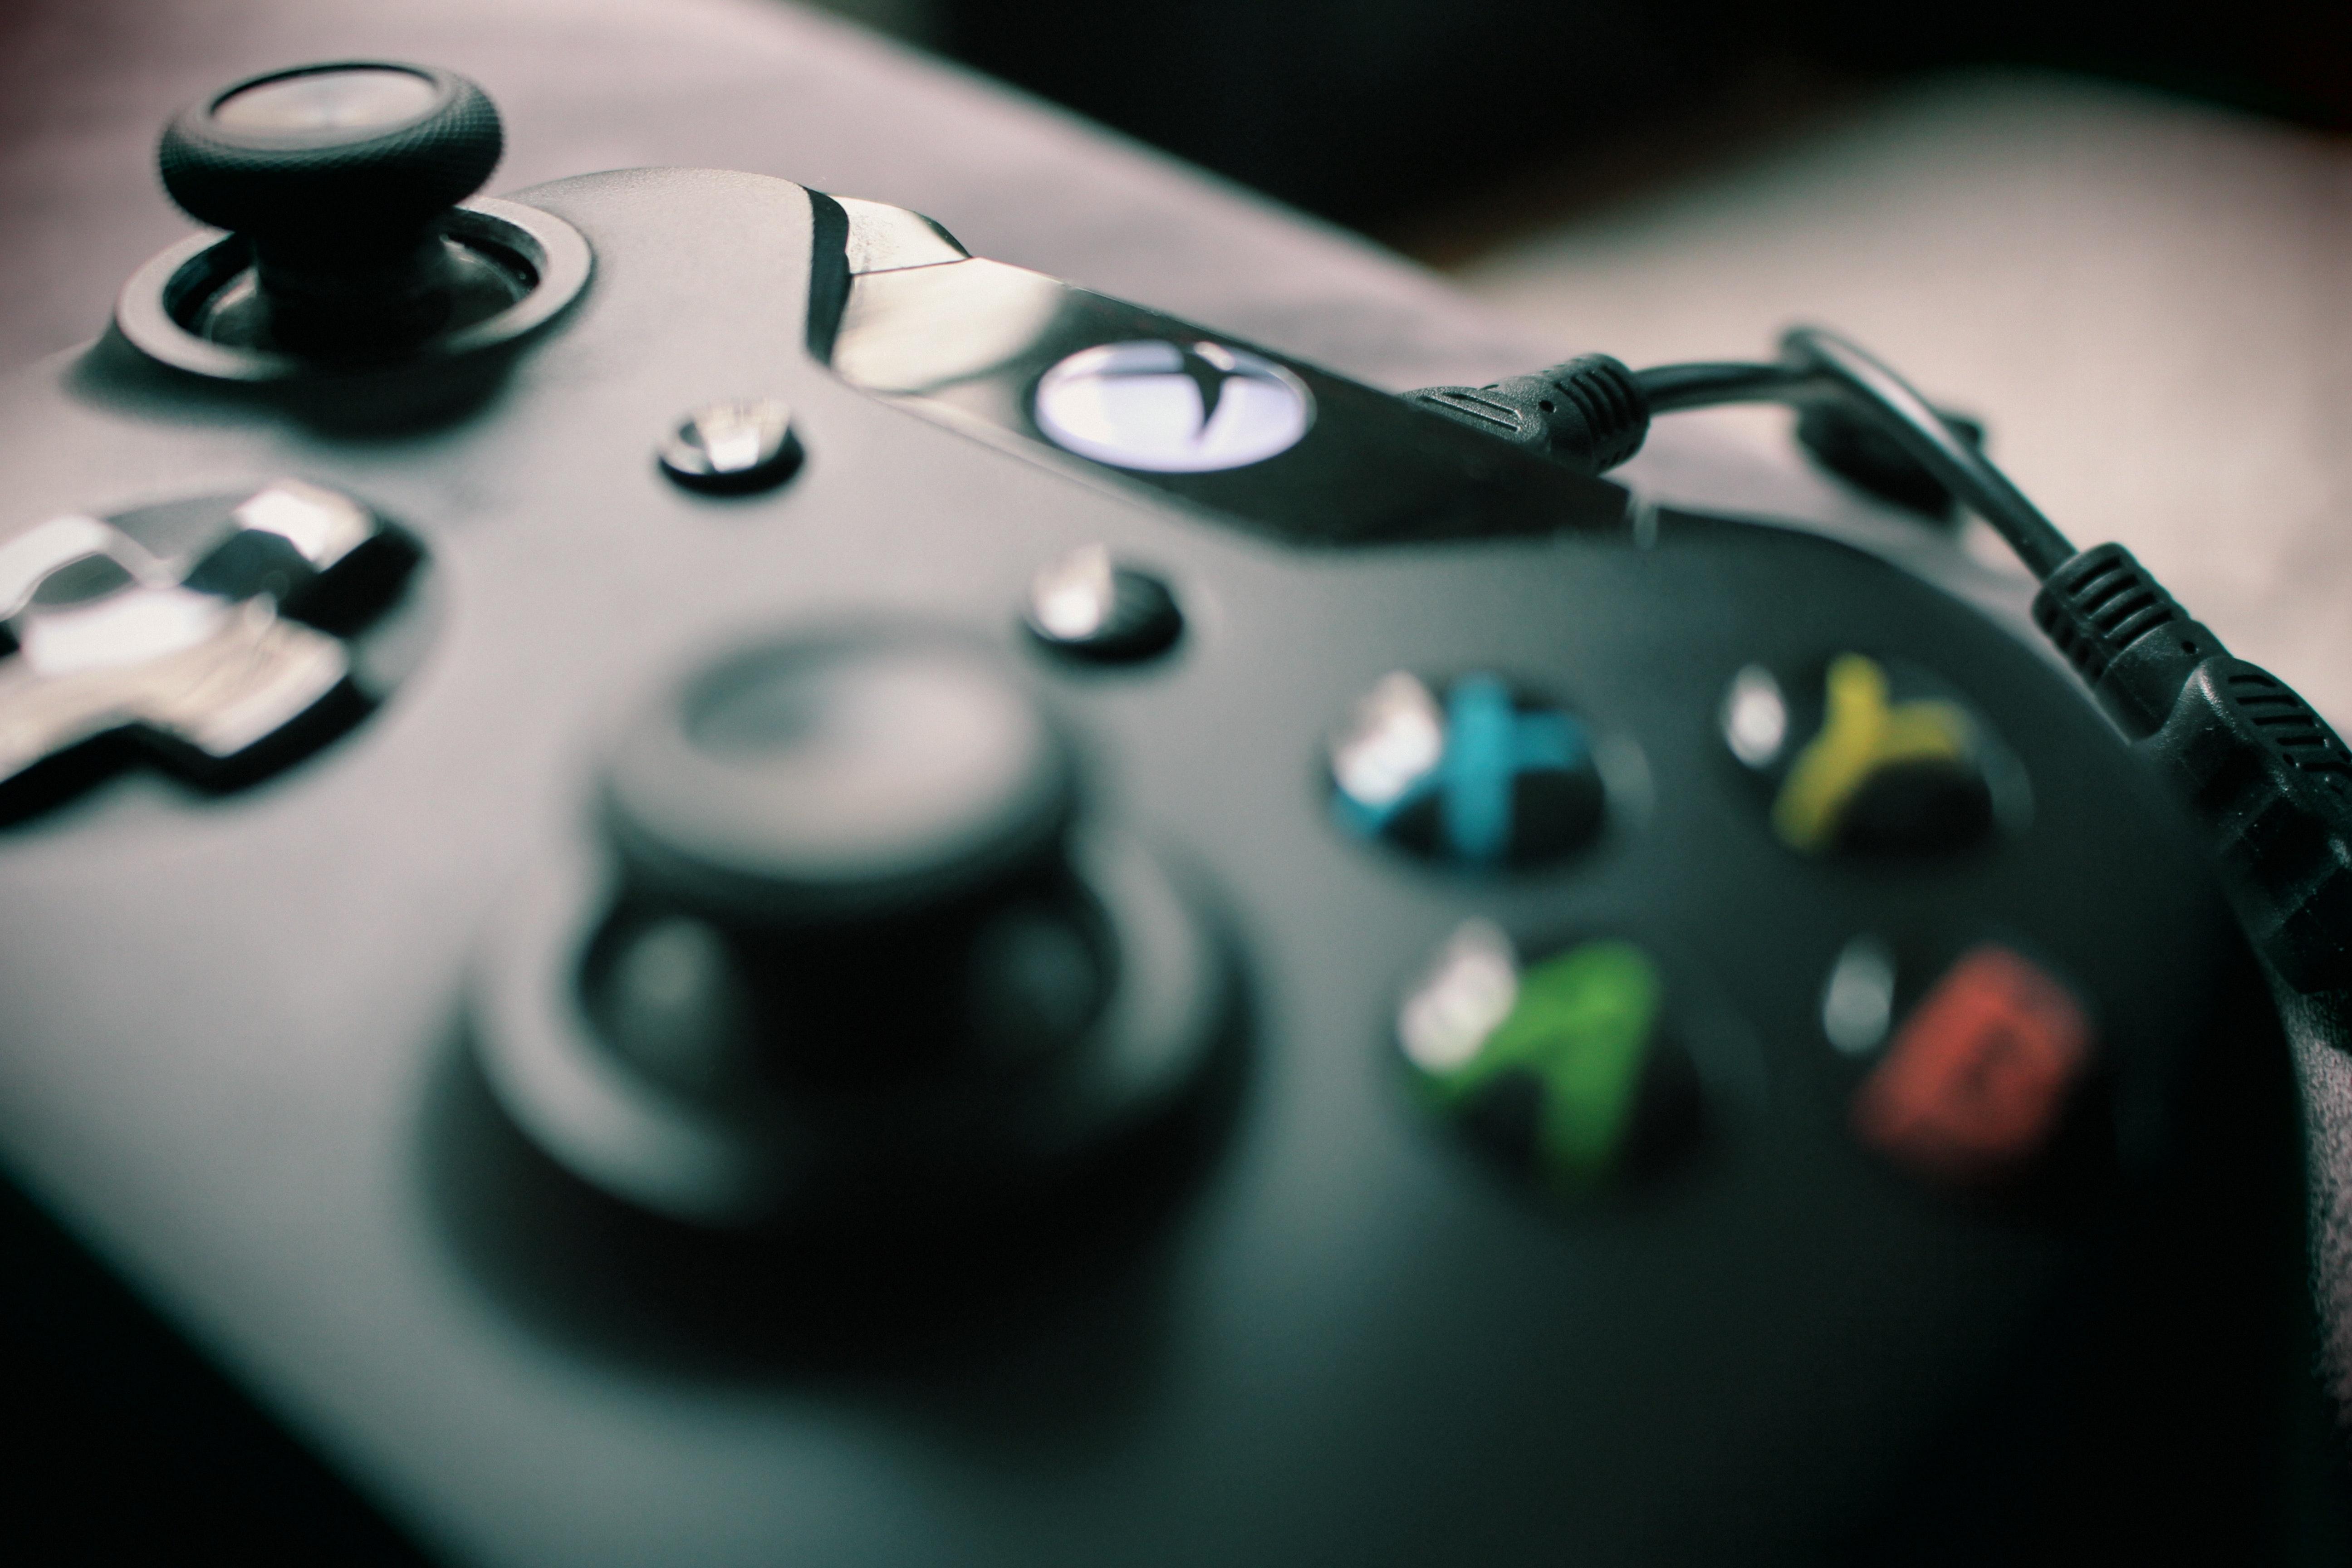 PlayStation 5 og Xbox Scarlett må tvinge frem ny skyteknologi